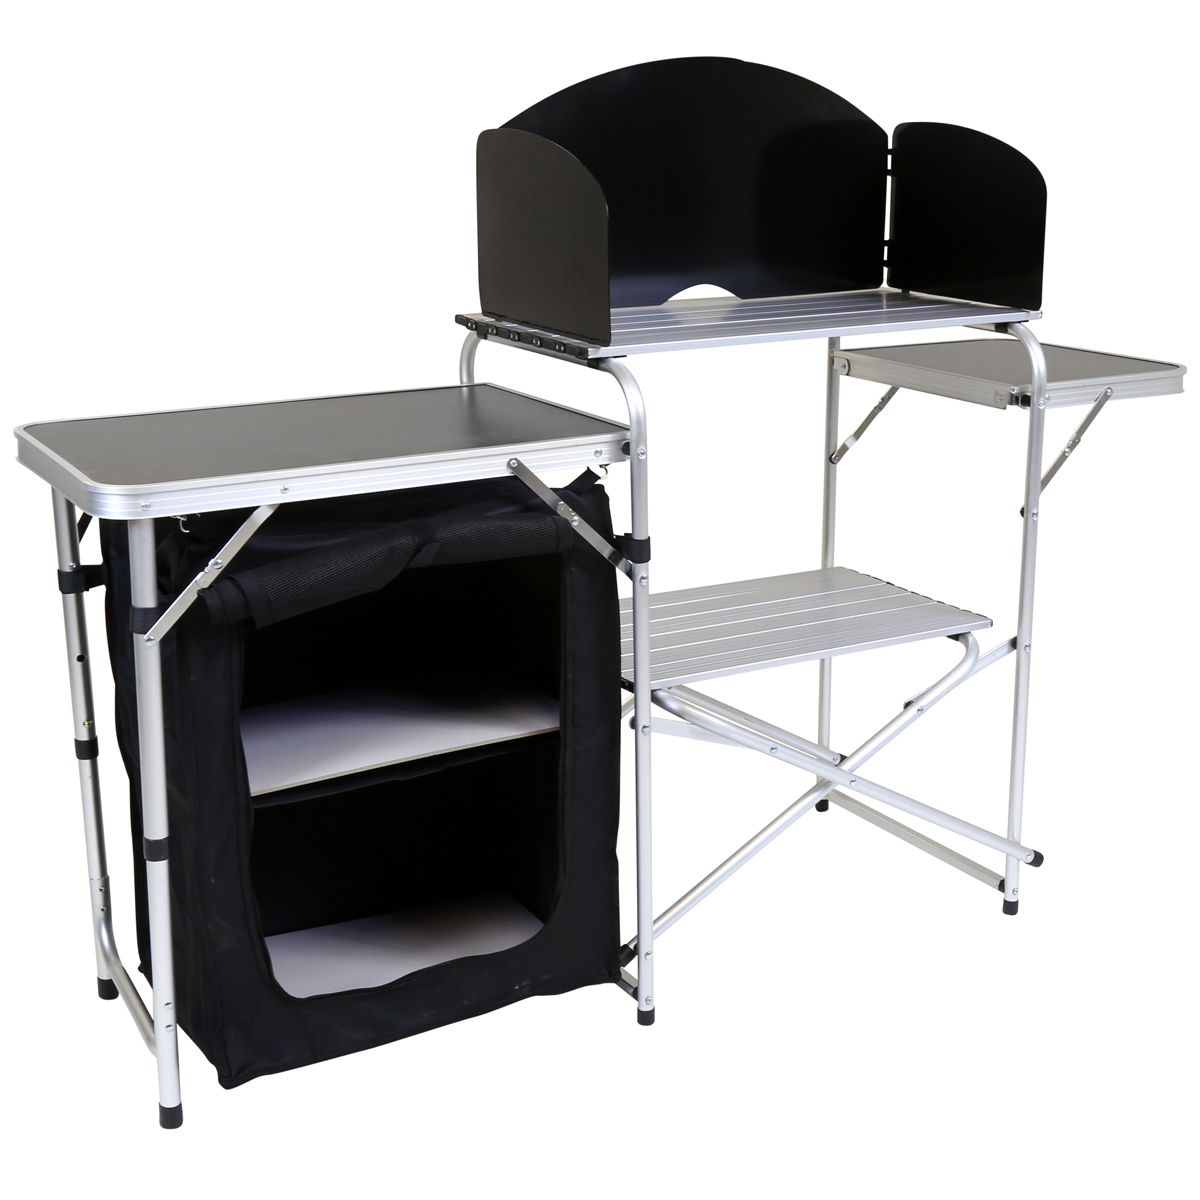 Charles Bentley Folding Kitchen Camping Storage Unit